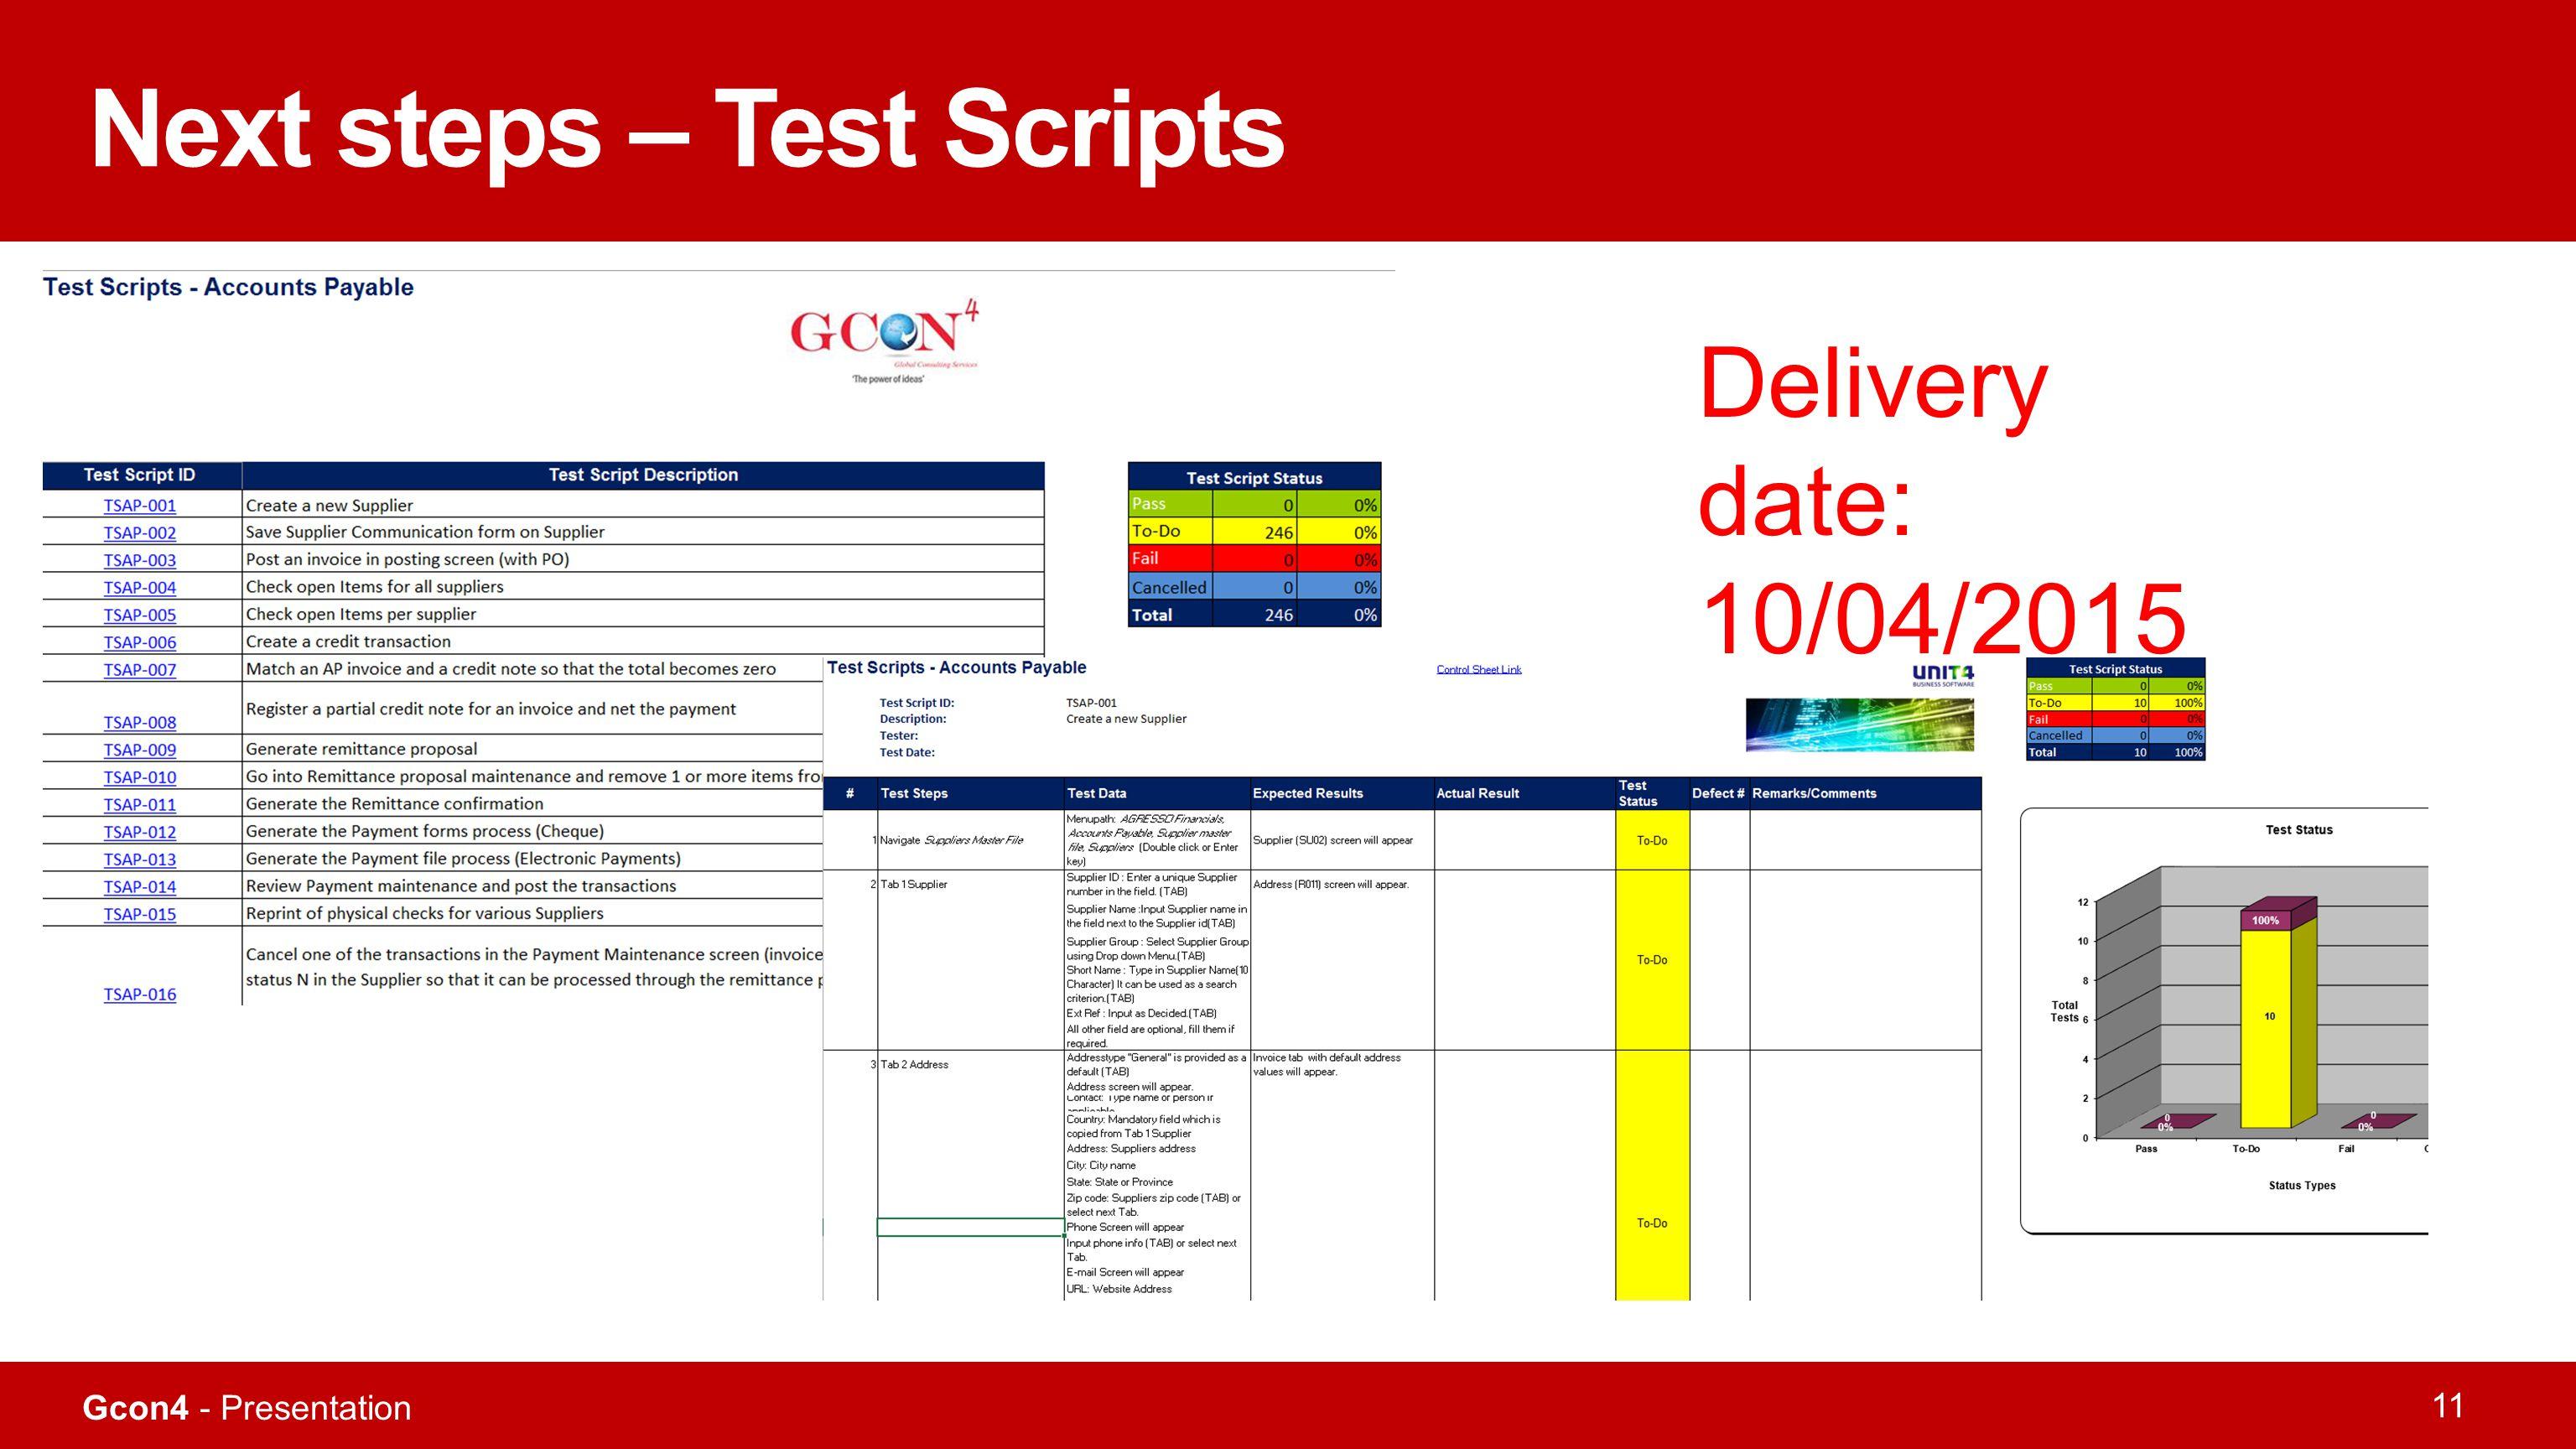 Gcon4 - Presentation 11 Next steps – Test Scripts Delivery date: 10/04/2015